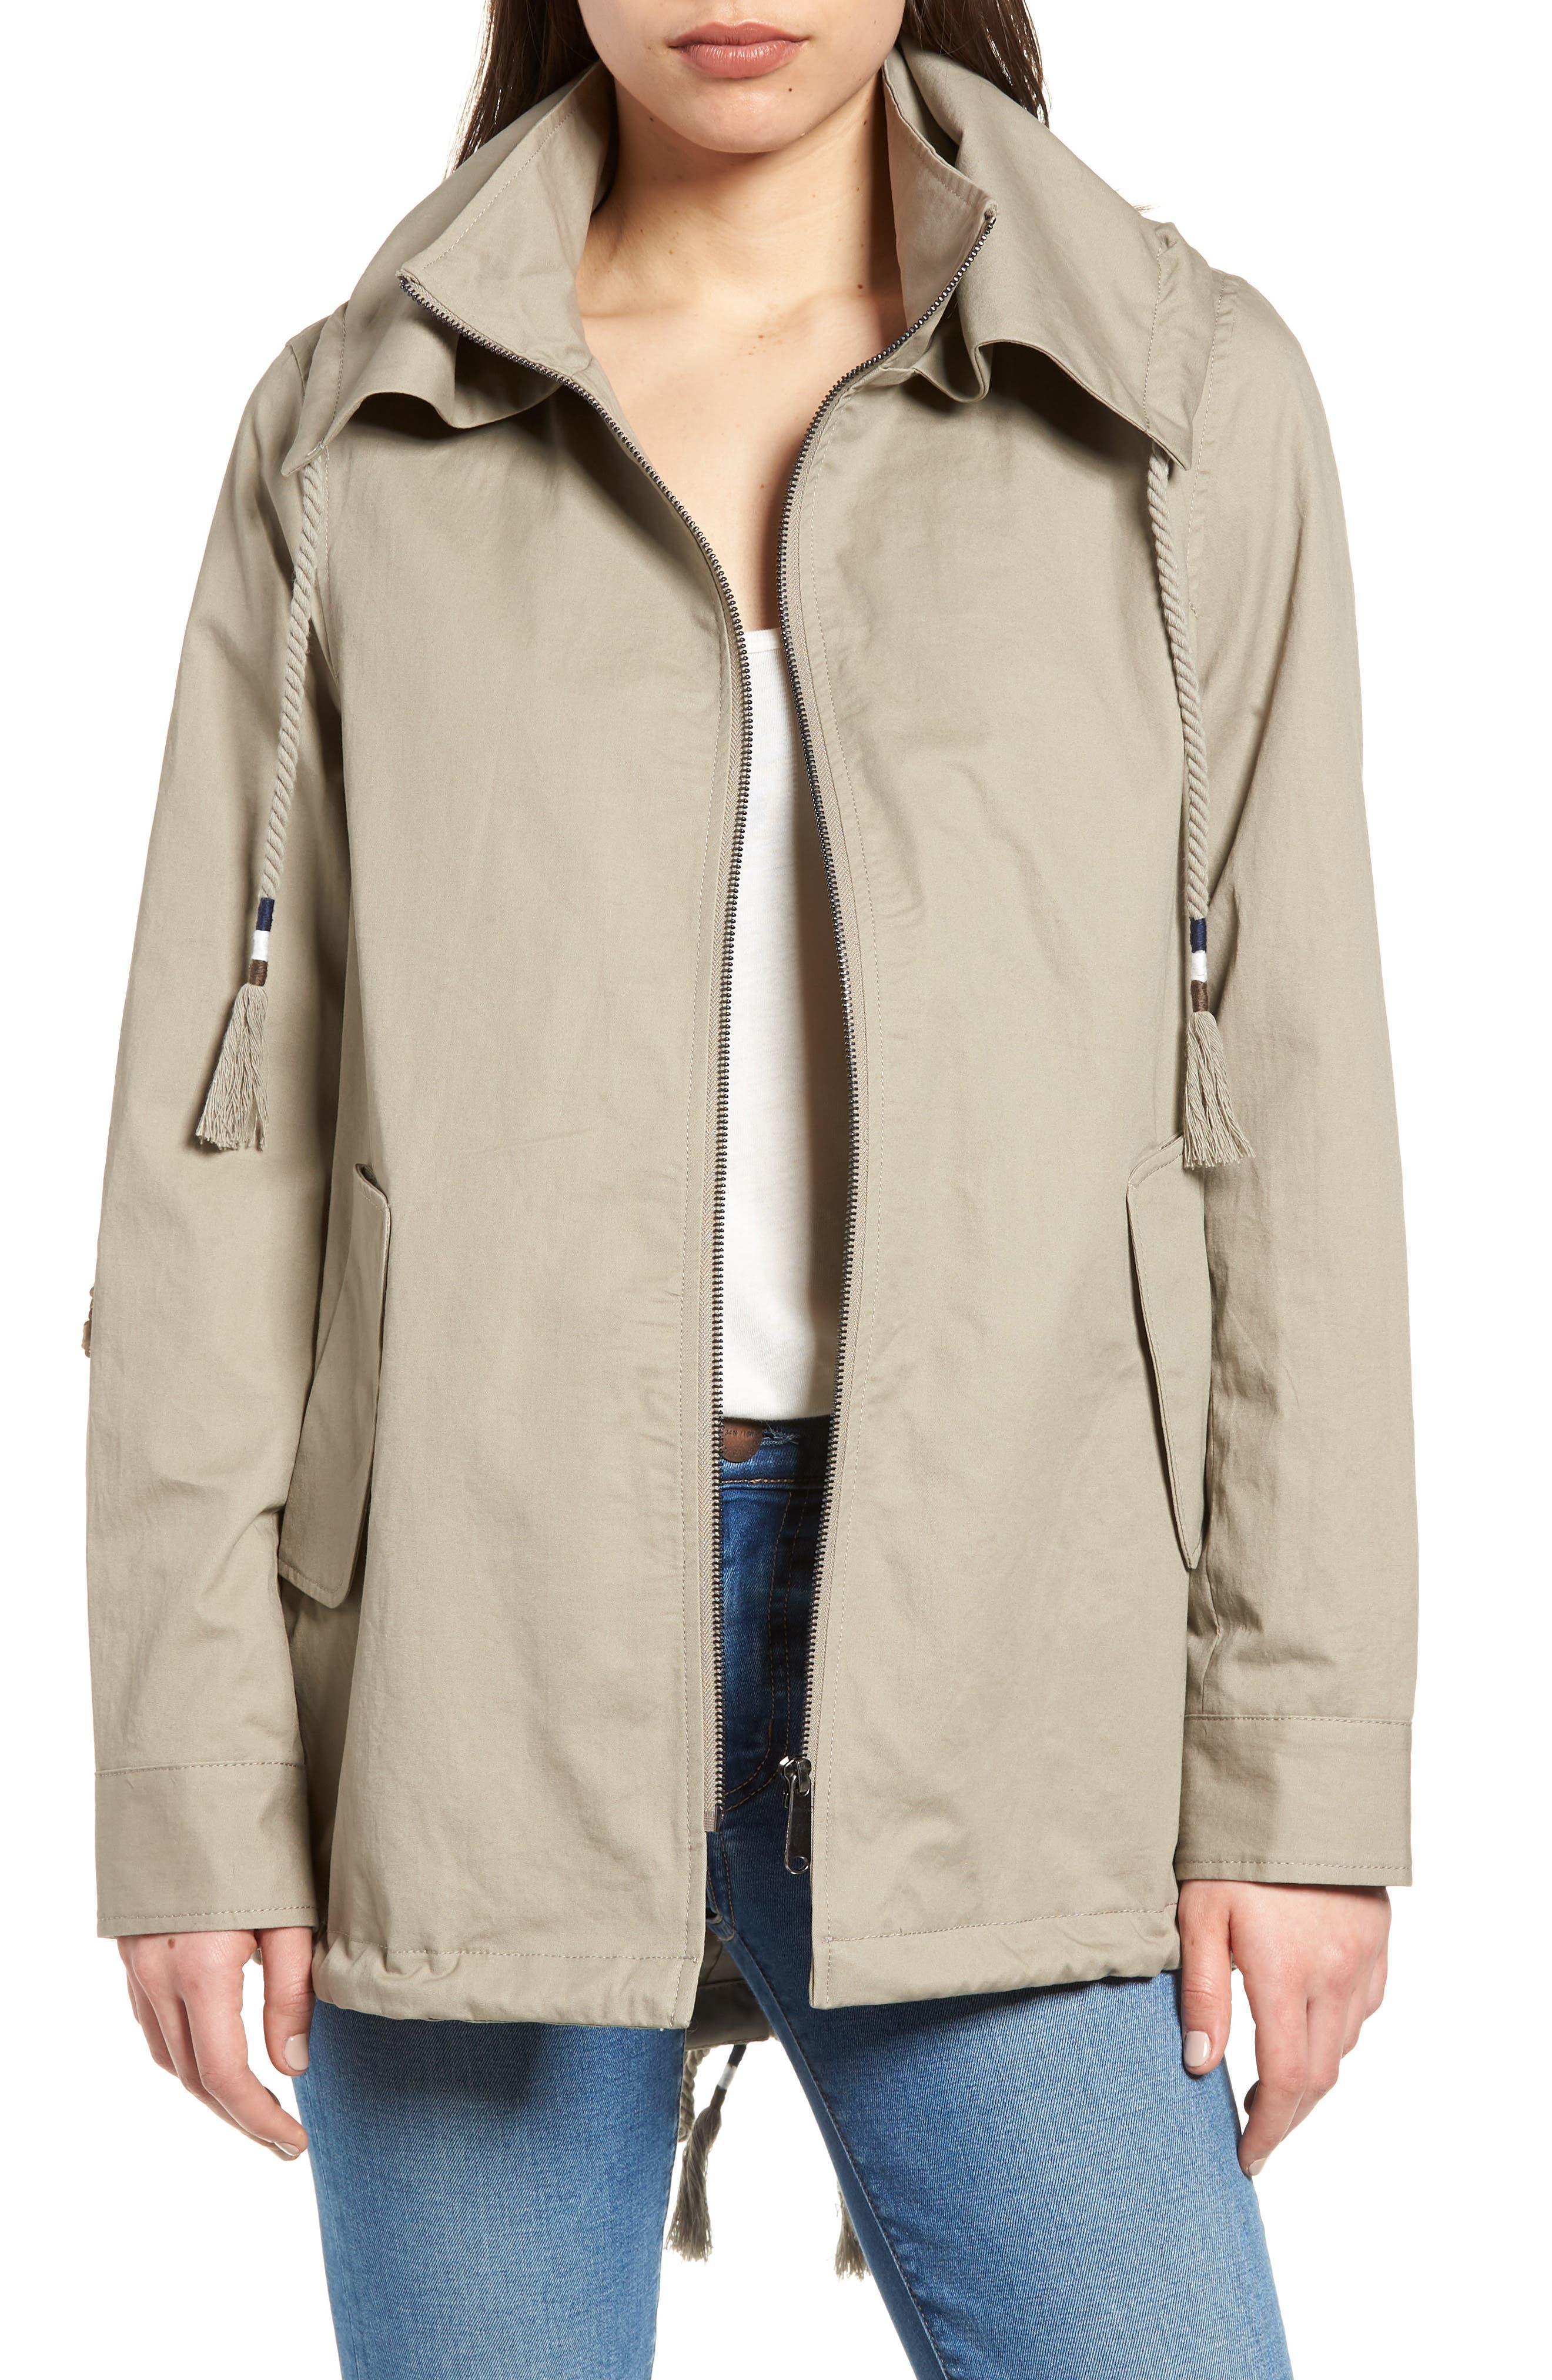 Sam Edelman Sequin Elbow Patch Anorak Jacket